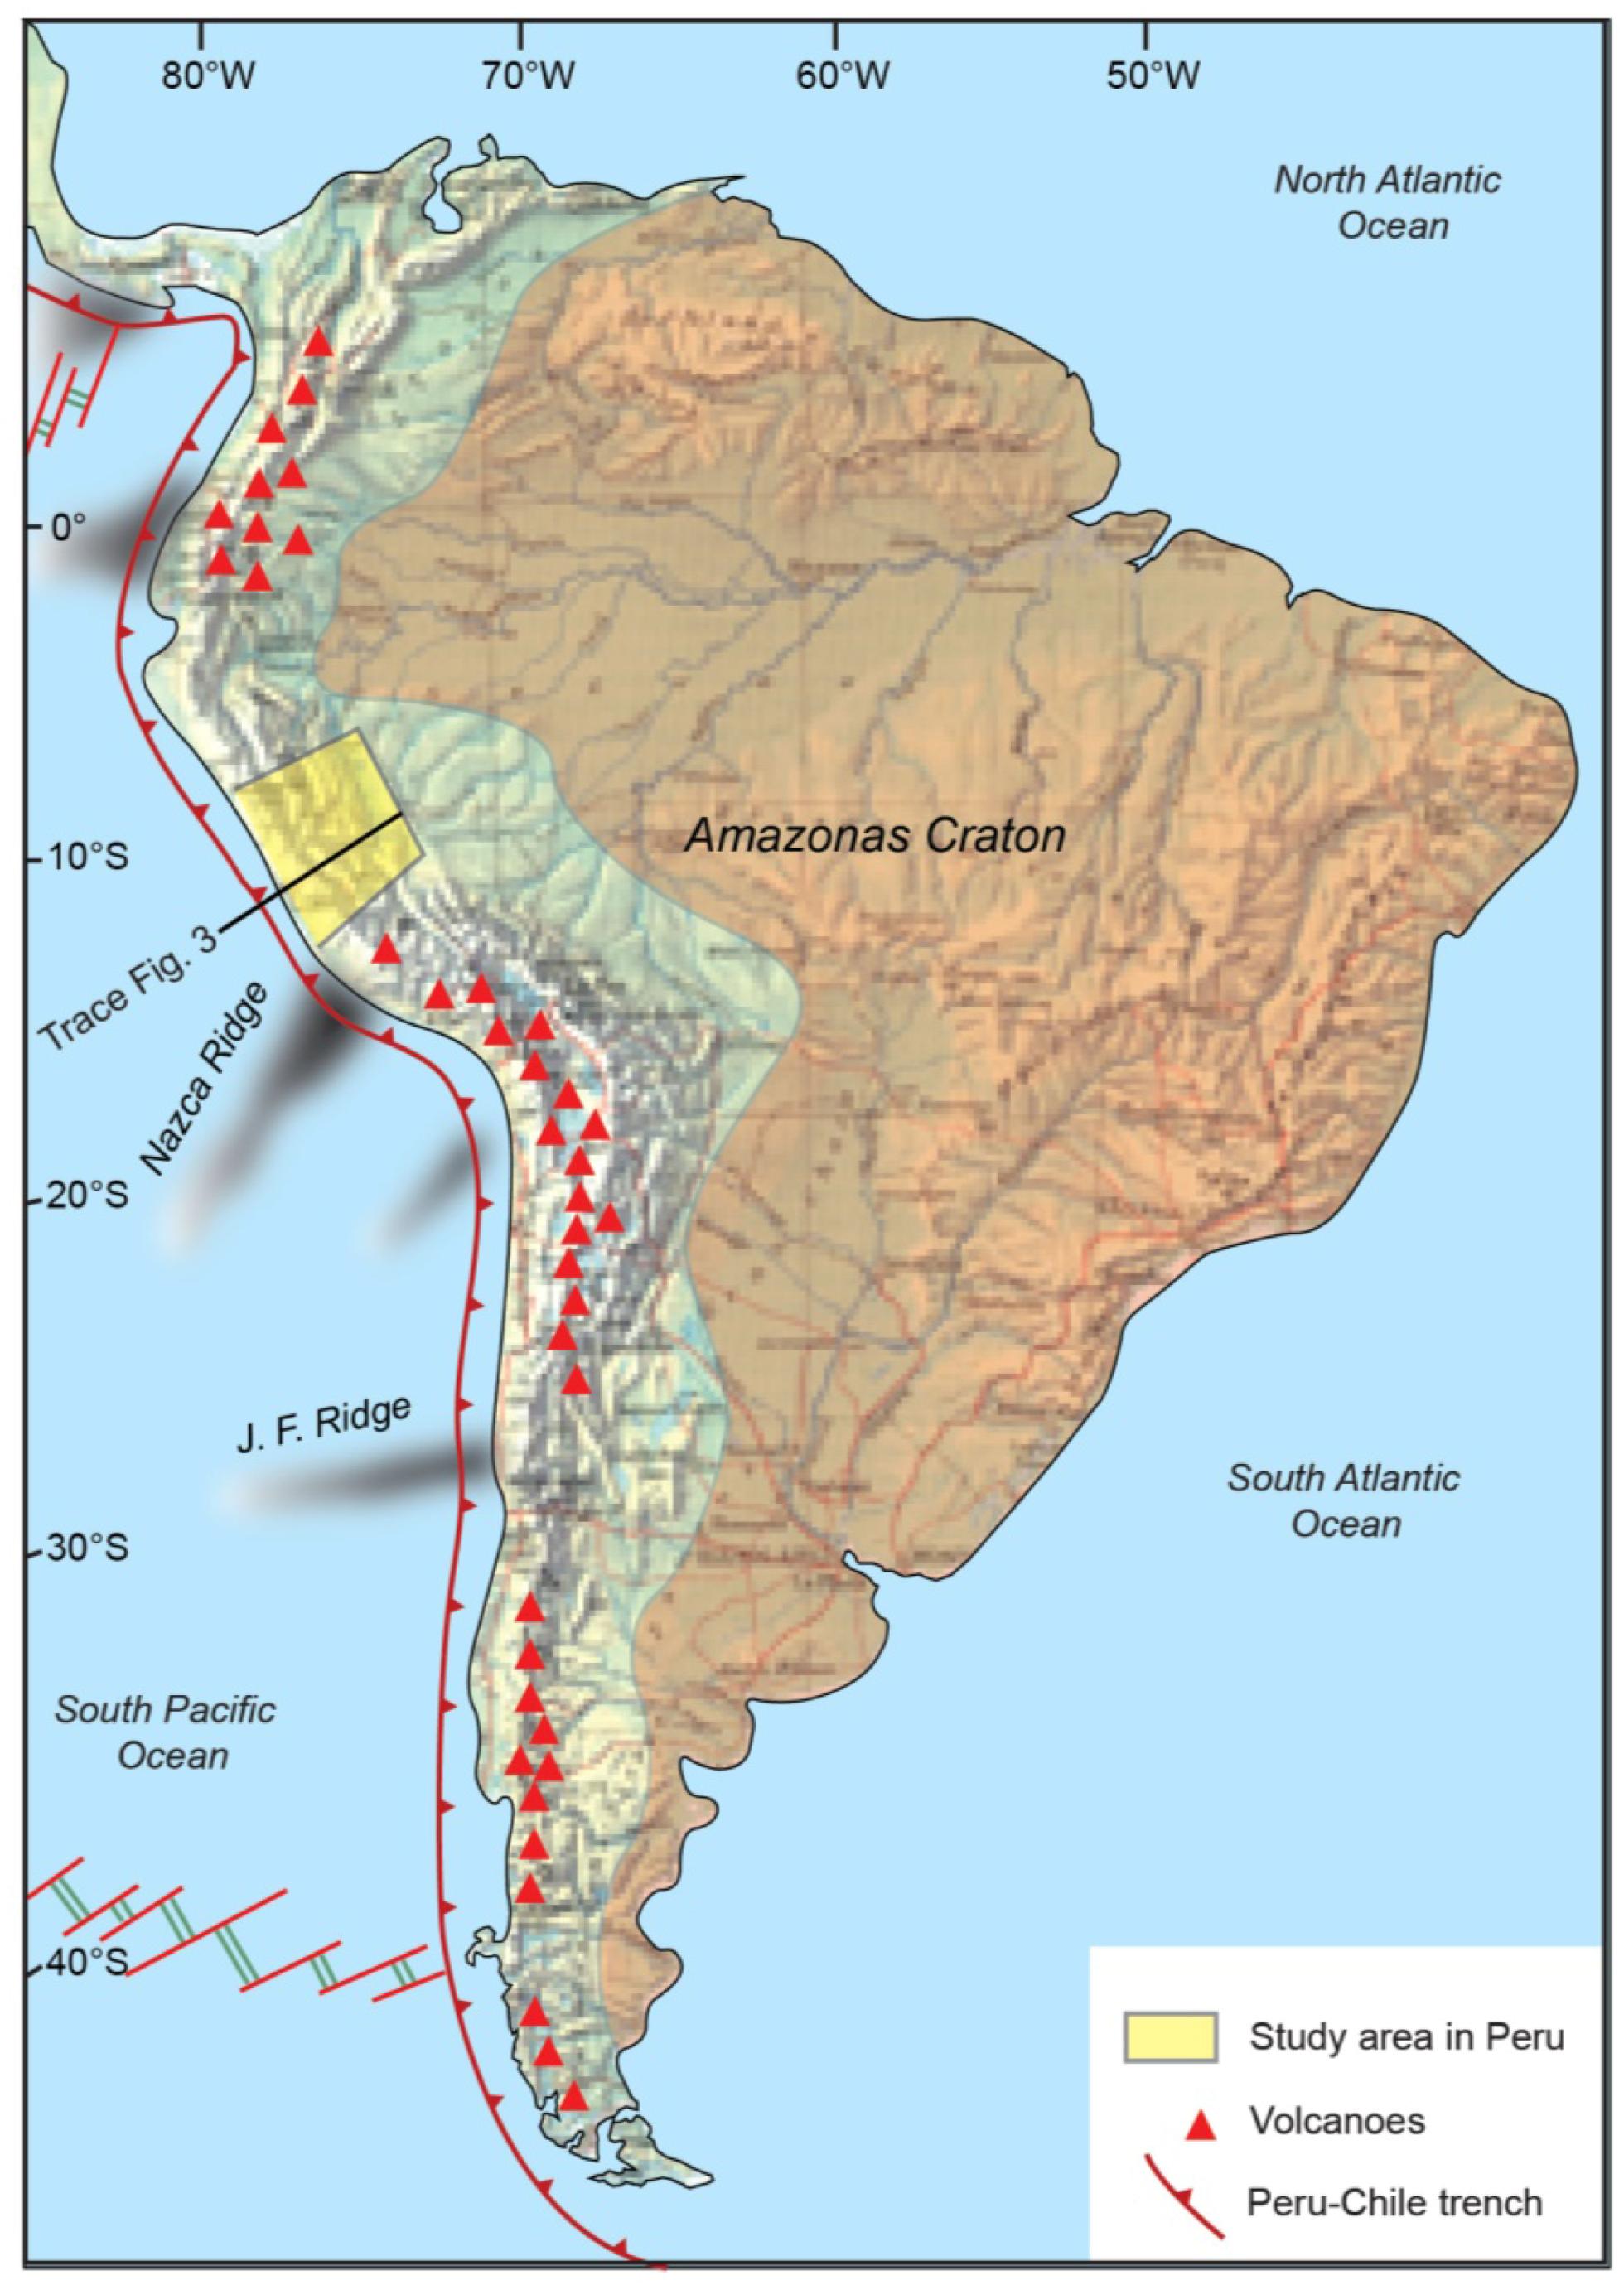 Geosciences | Free Full-Text | Mesozoic–Cenozoic Evolution ...